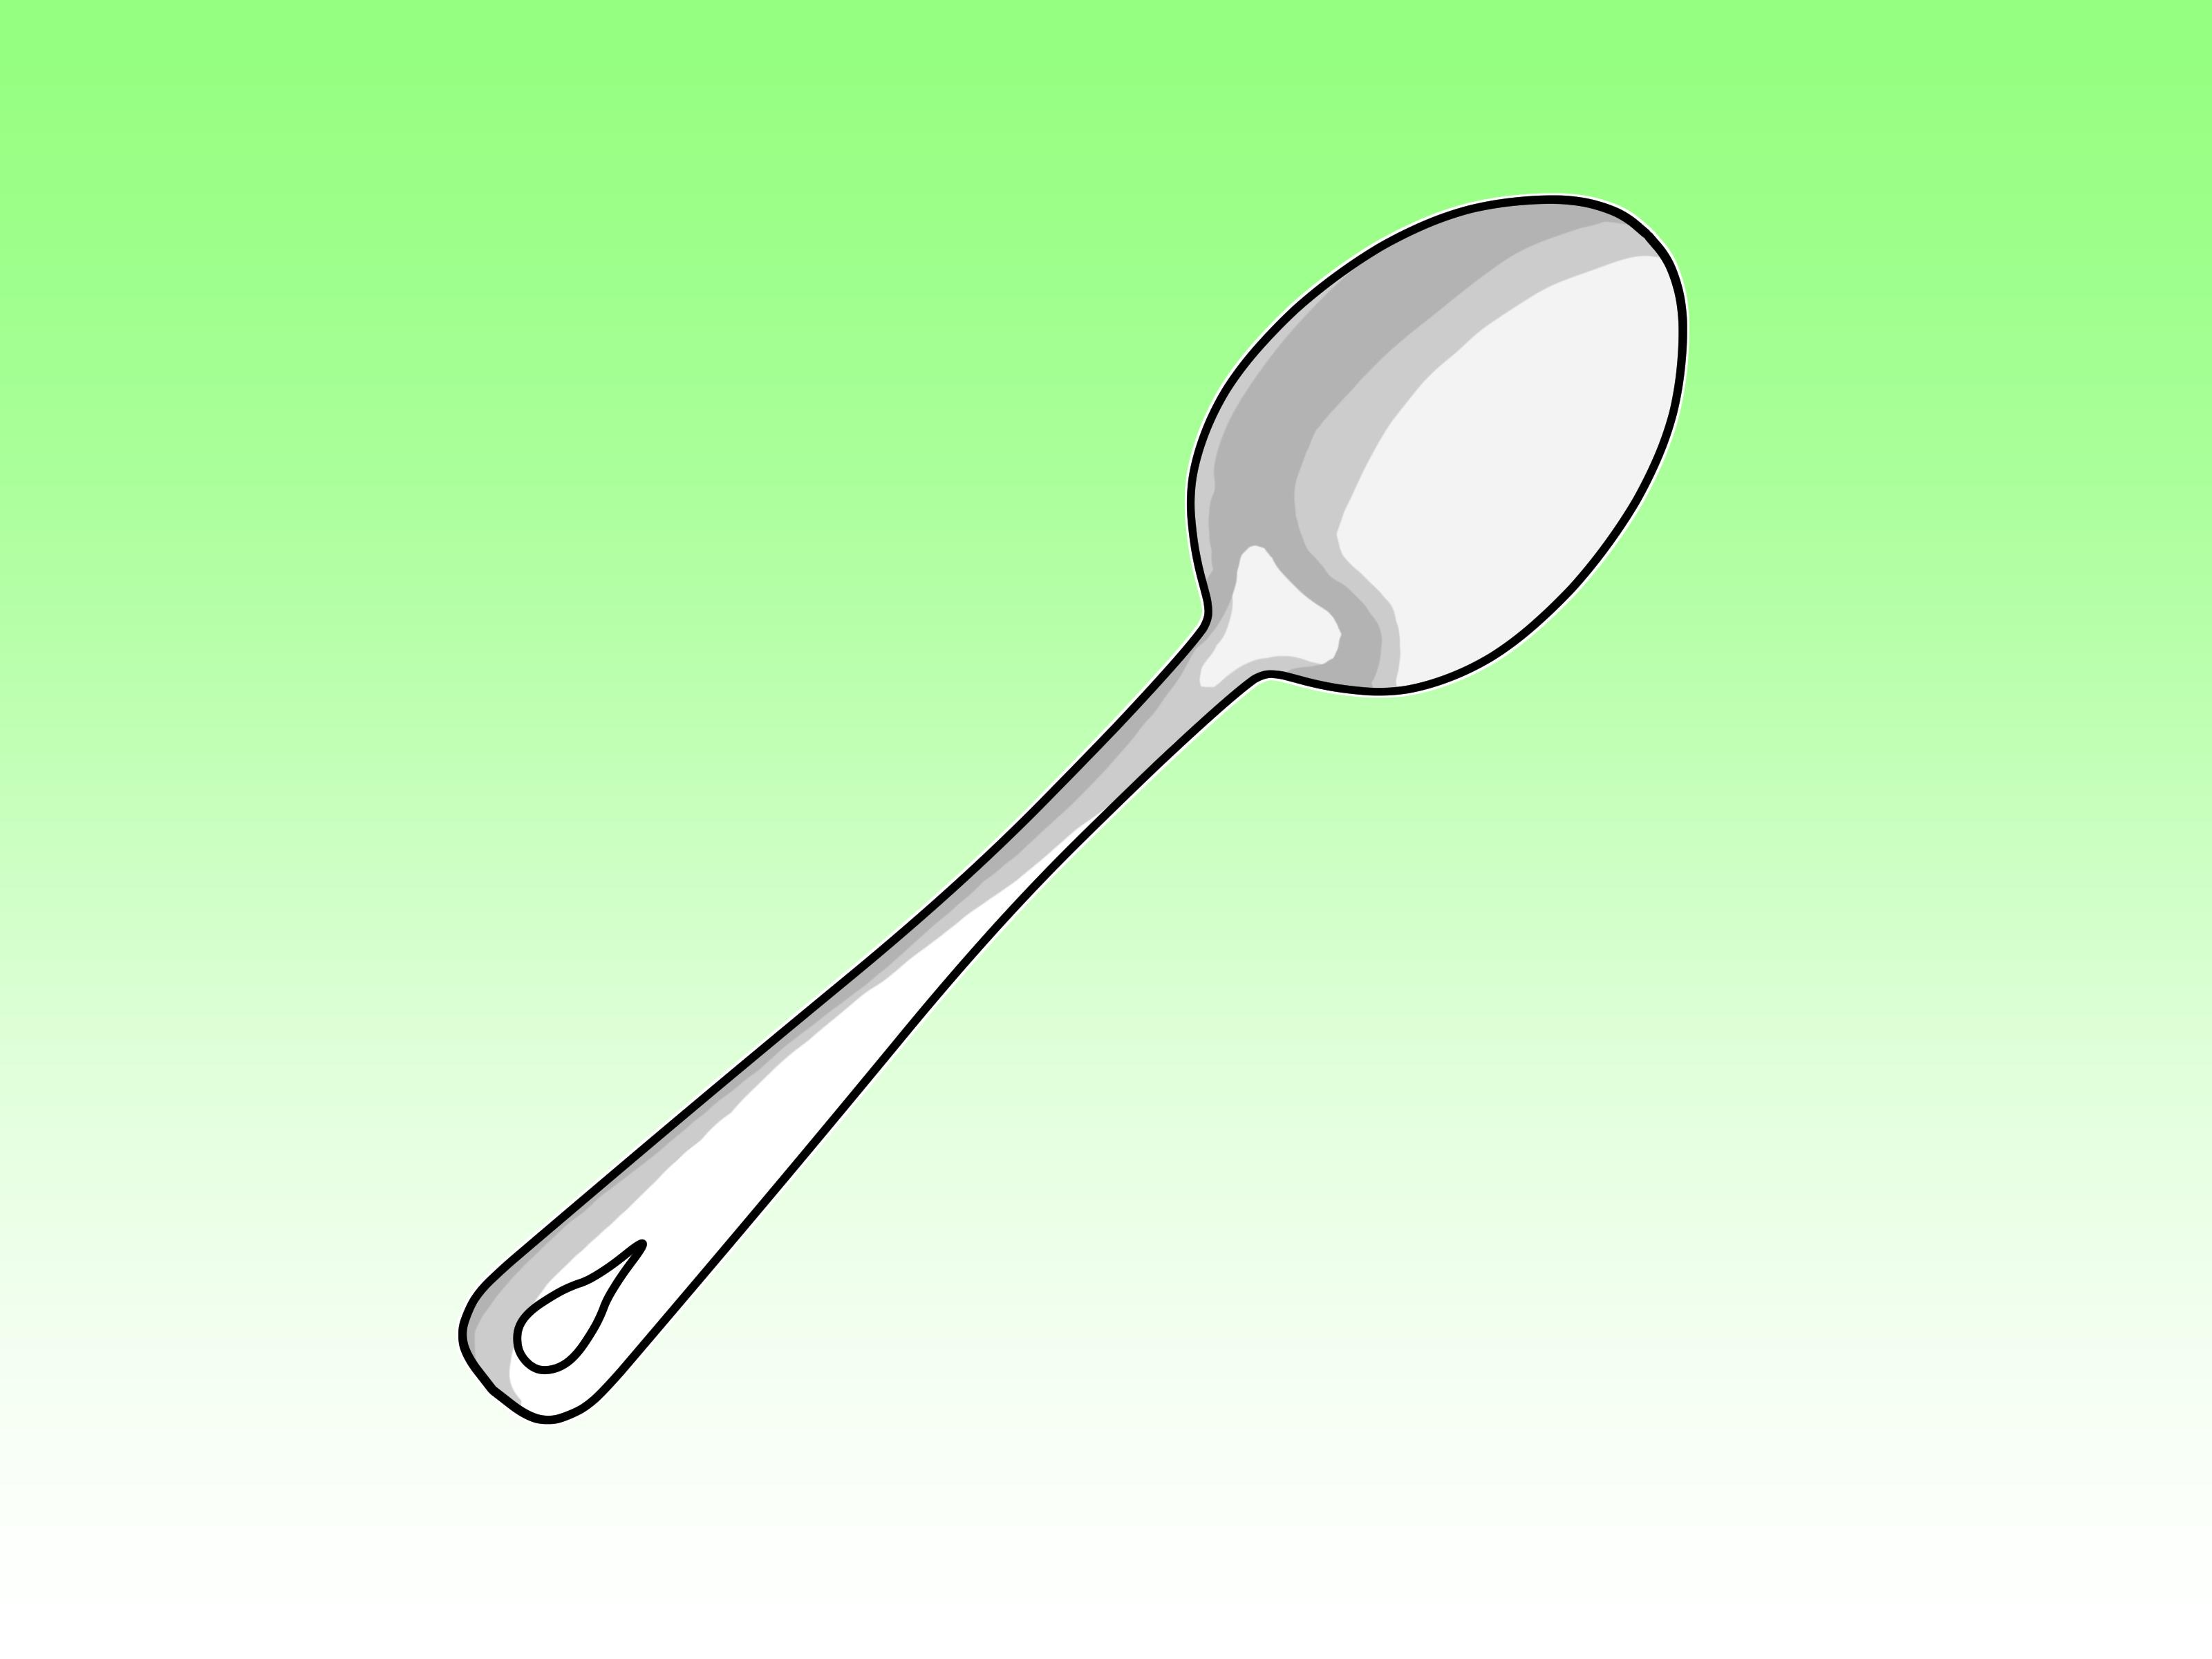 Drawn spoon  to Spoon: a Draw